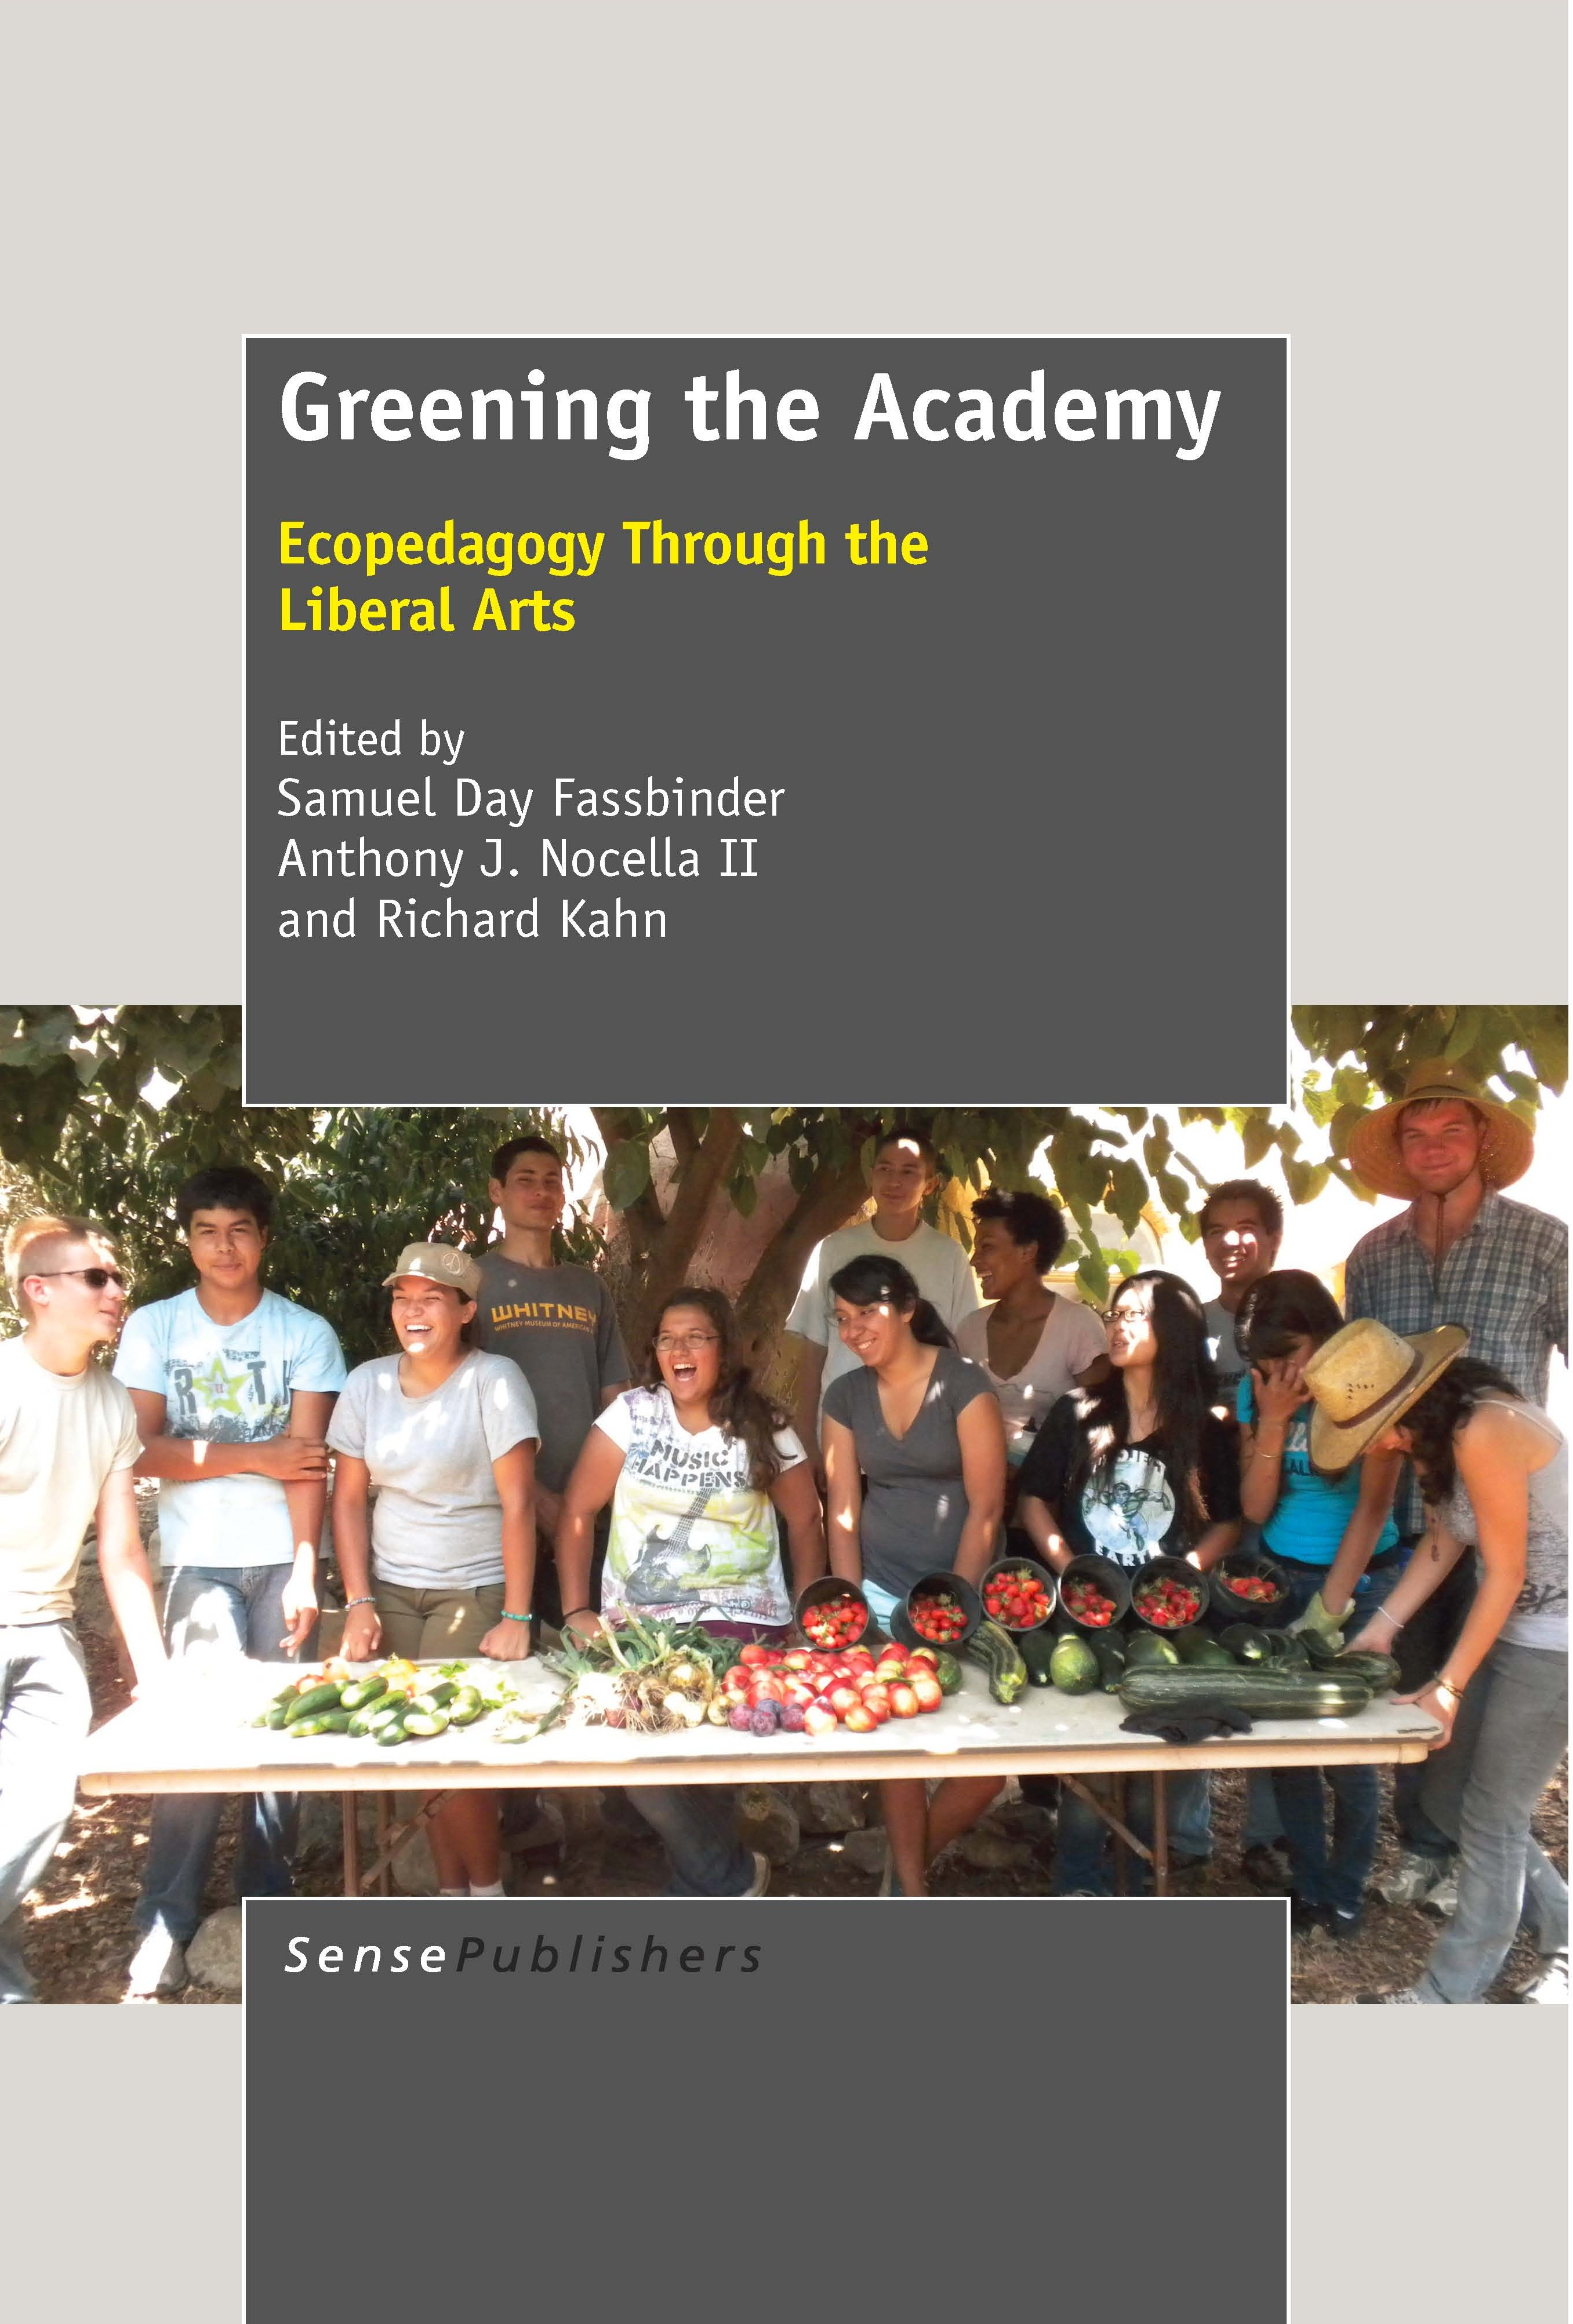 Greening the Academy: Ecopedagogy Through the Liberal Arts